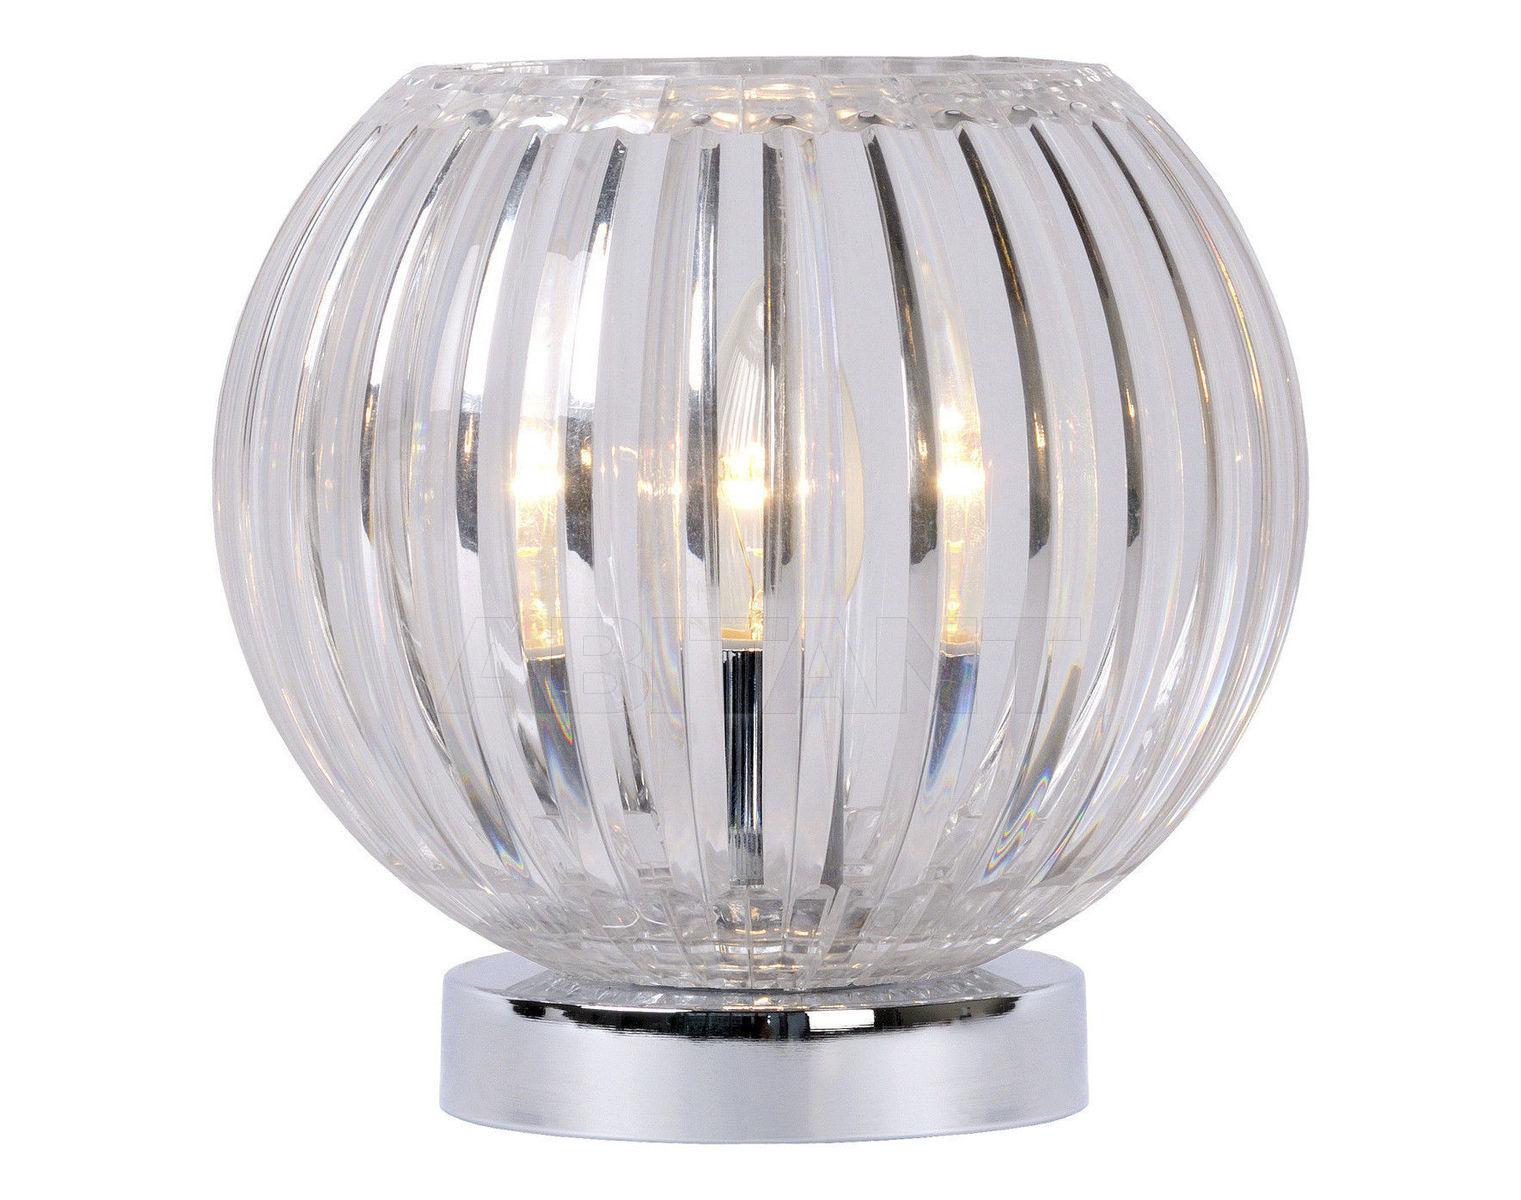 Купить Лампа настольная ZEJA Lucide  Modern 18518/01/11